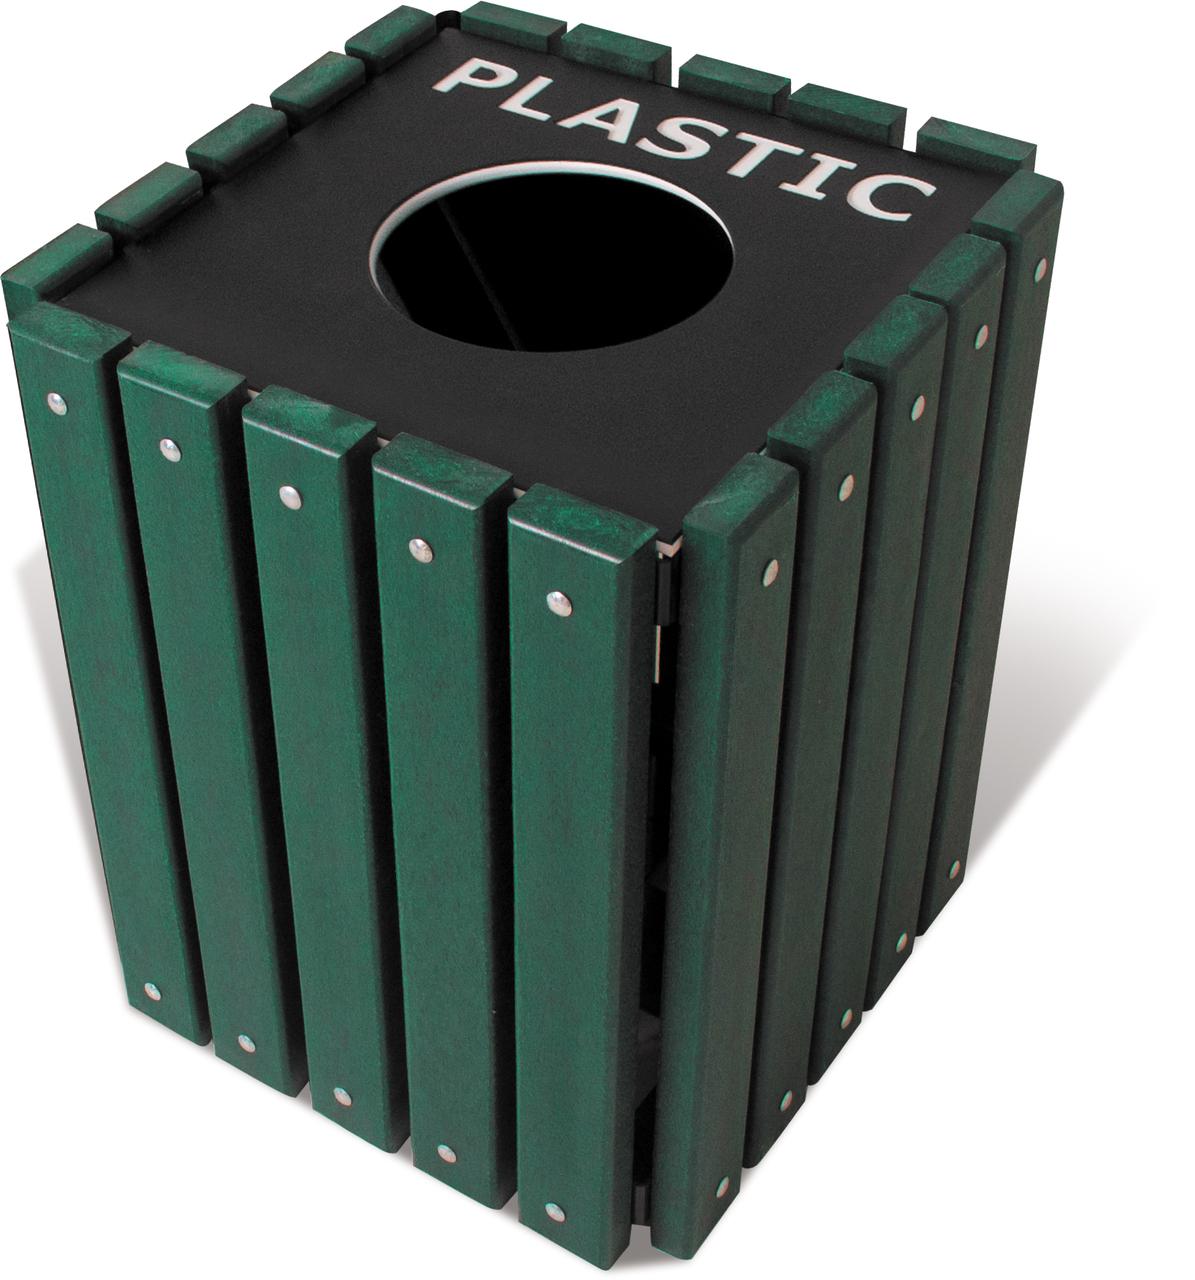 trsq-20-grn-singlerecyclingreceptacle-us27-063-39856.1426114214.1280.1280.jpg